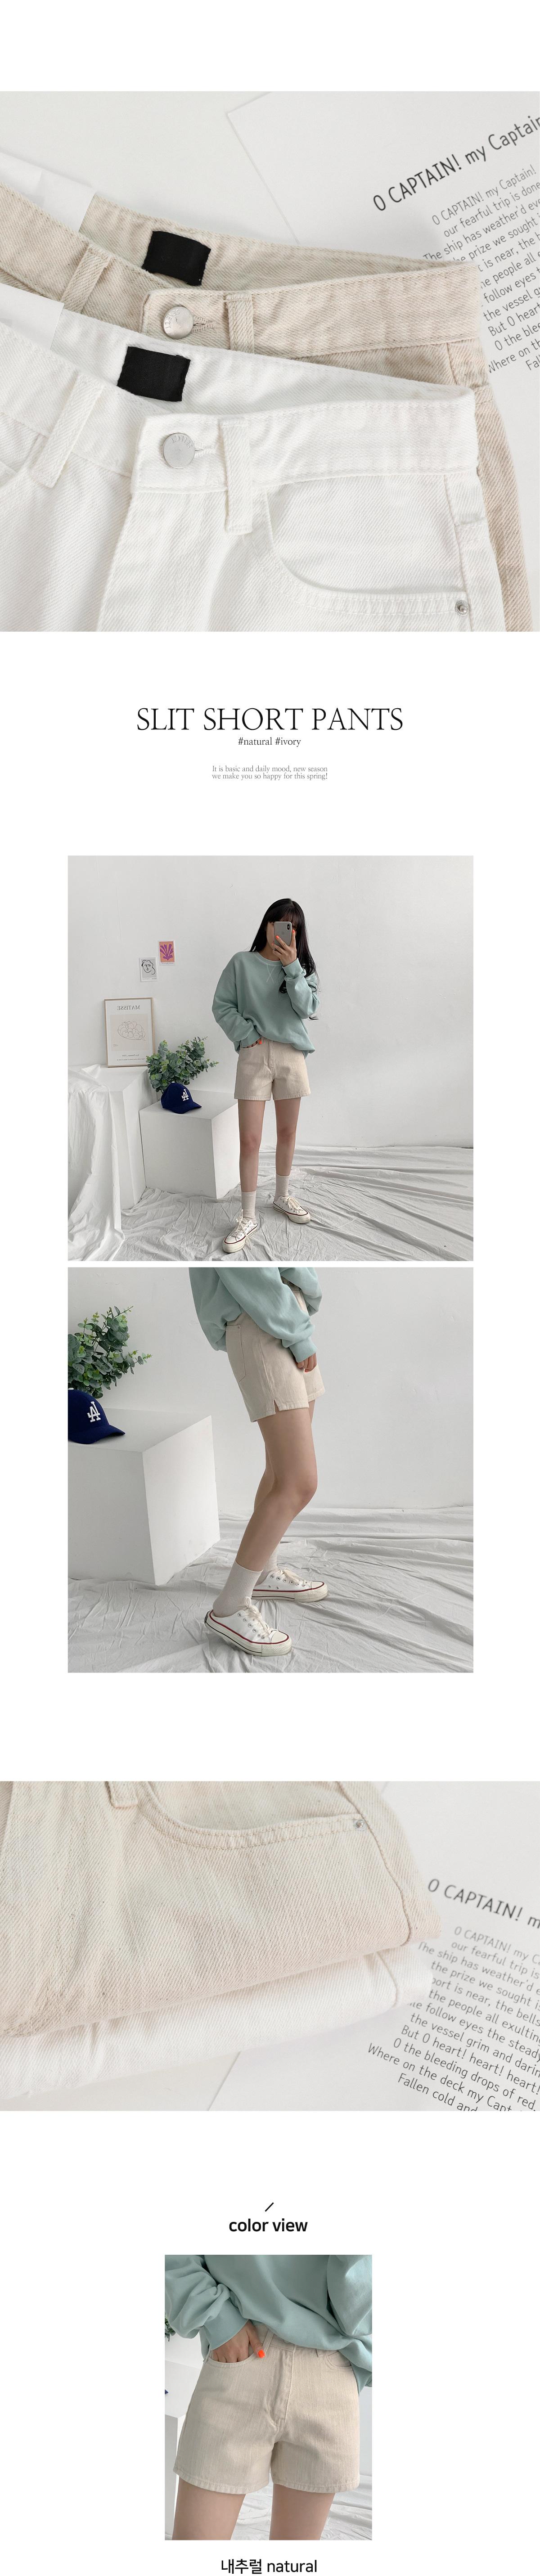 Retel Lim 3.5 Pants